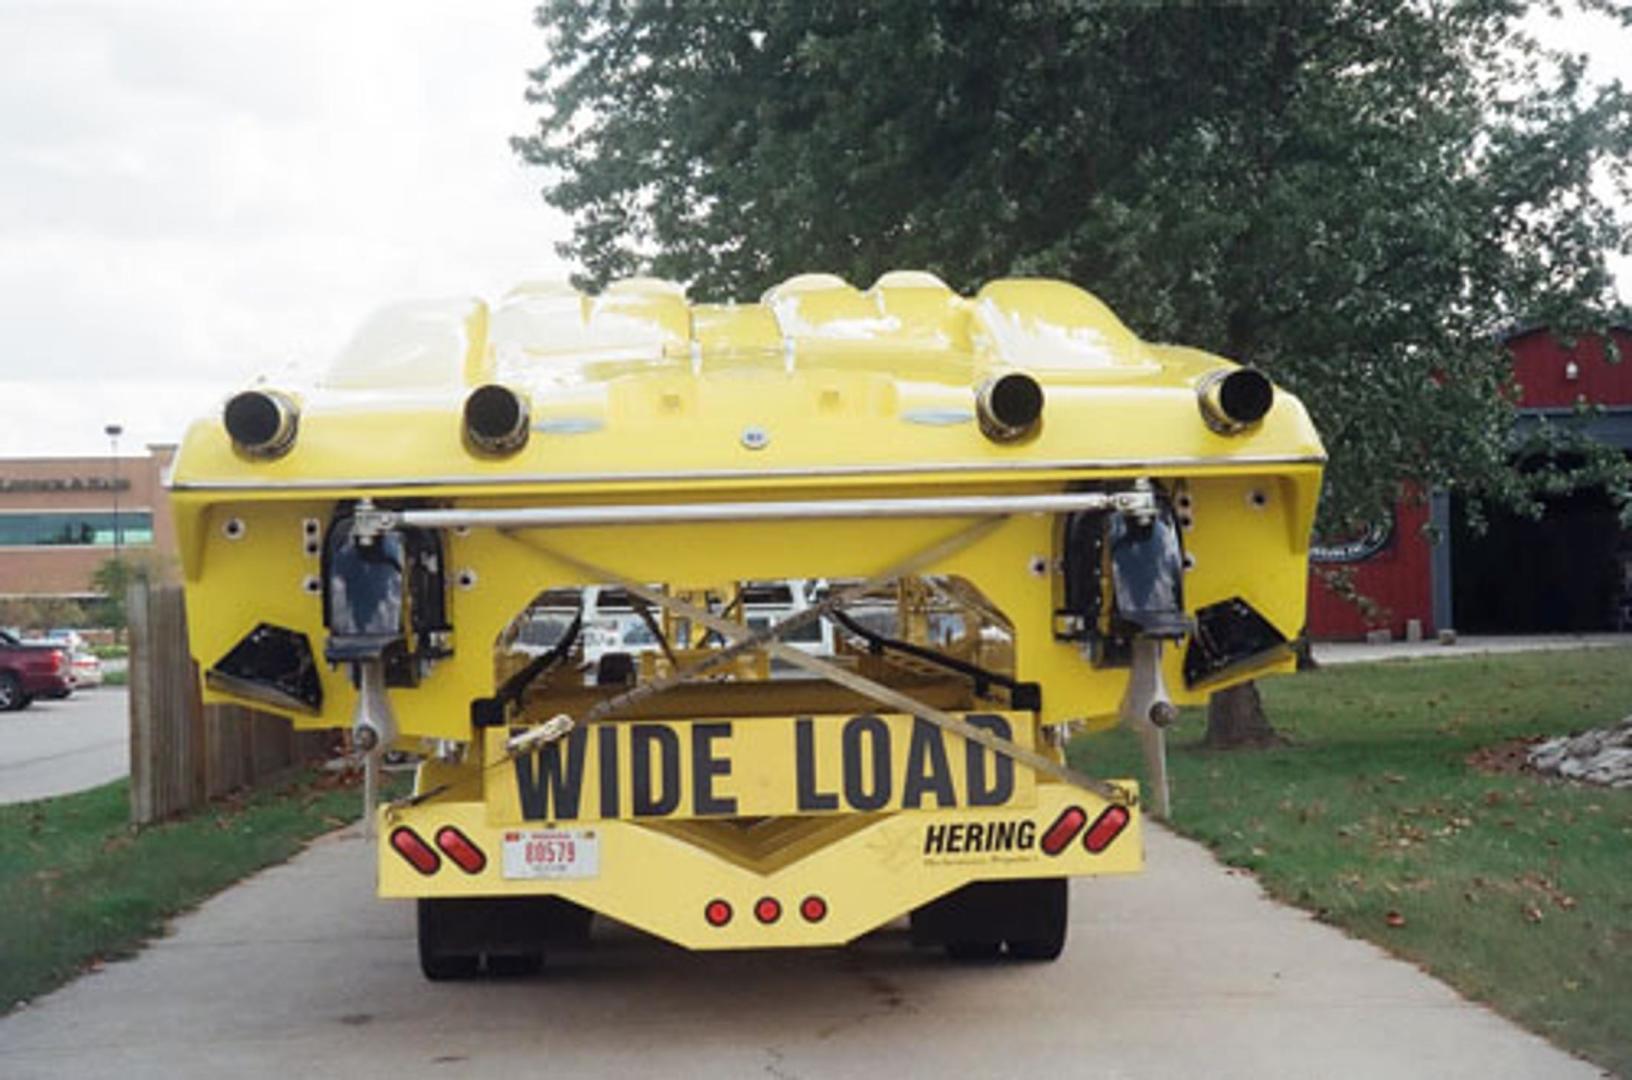 Nor-Tech-5000 Supercat 2002-PREDATOR IV Greenwood-Indiana-United States-300836 | Thumbnail